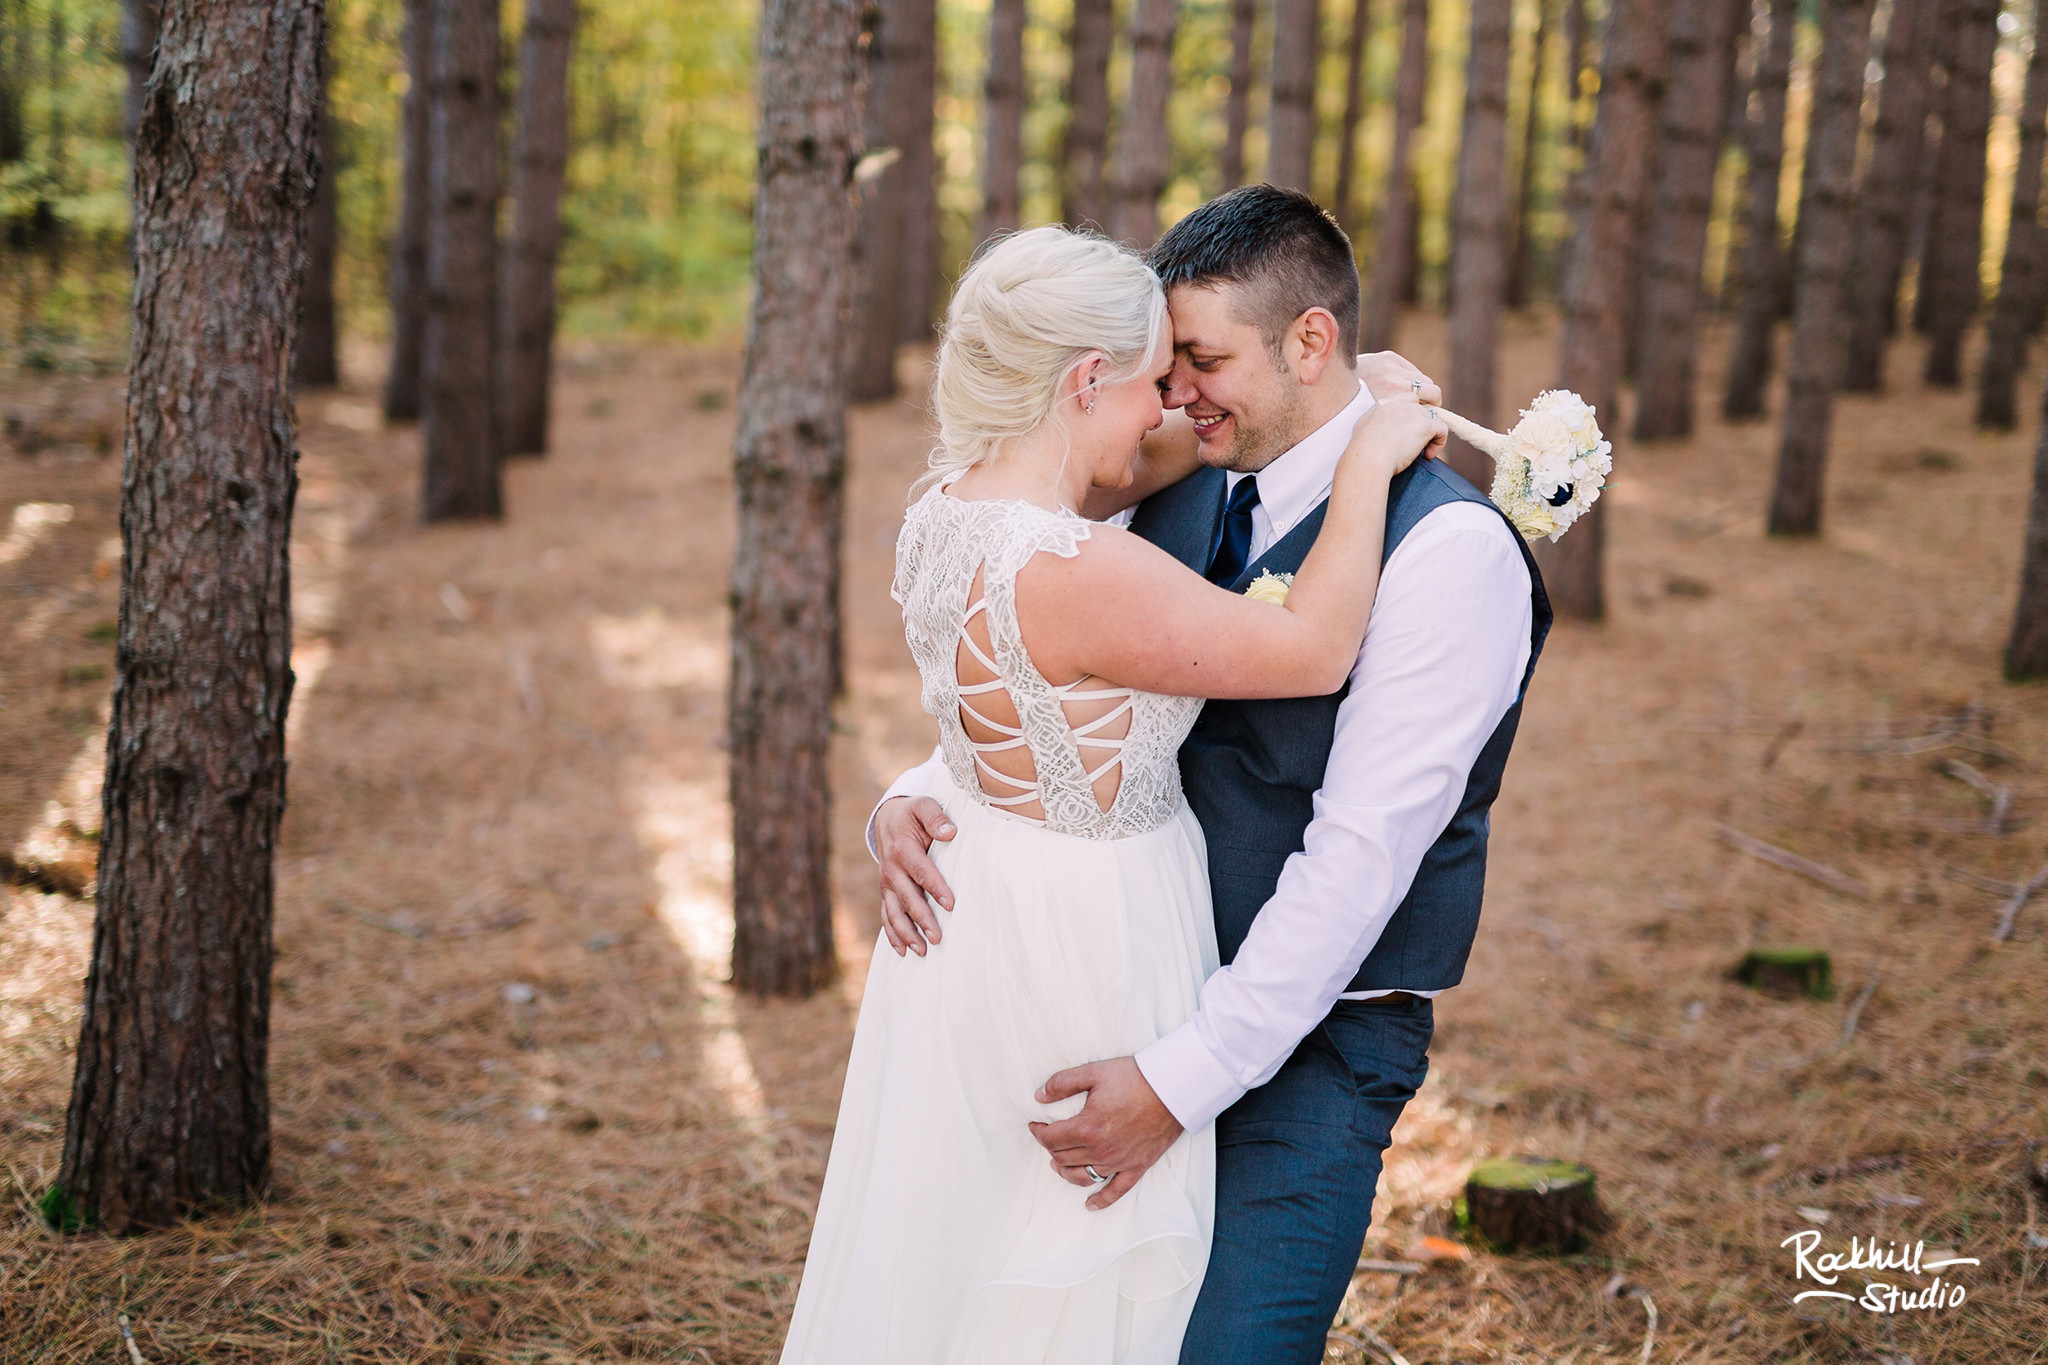 Traverse City Wedding Photographer, northern michigan pine trees ceremony, Rockhill Studio